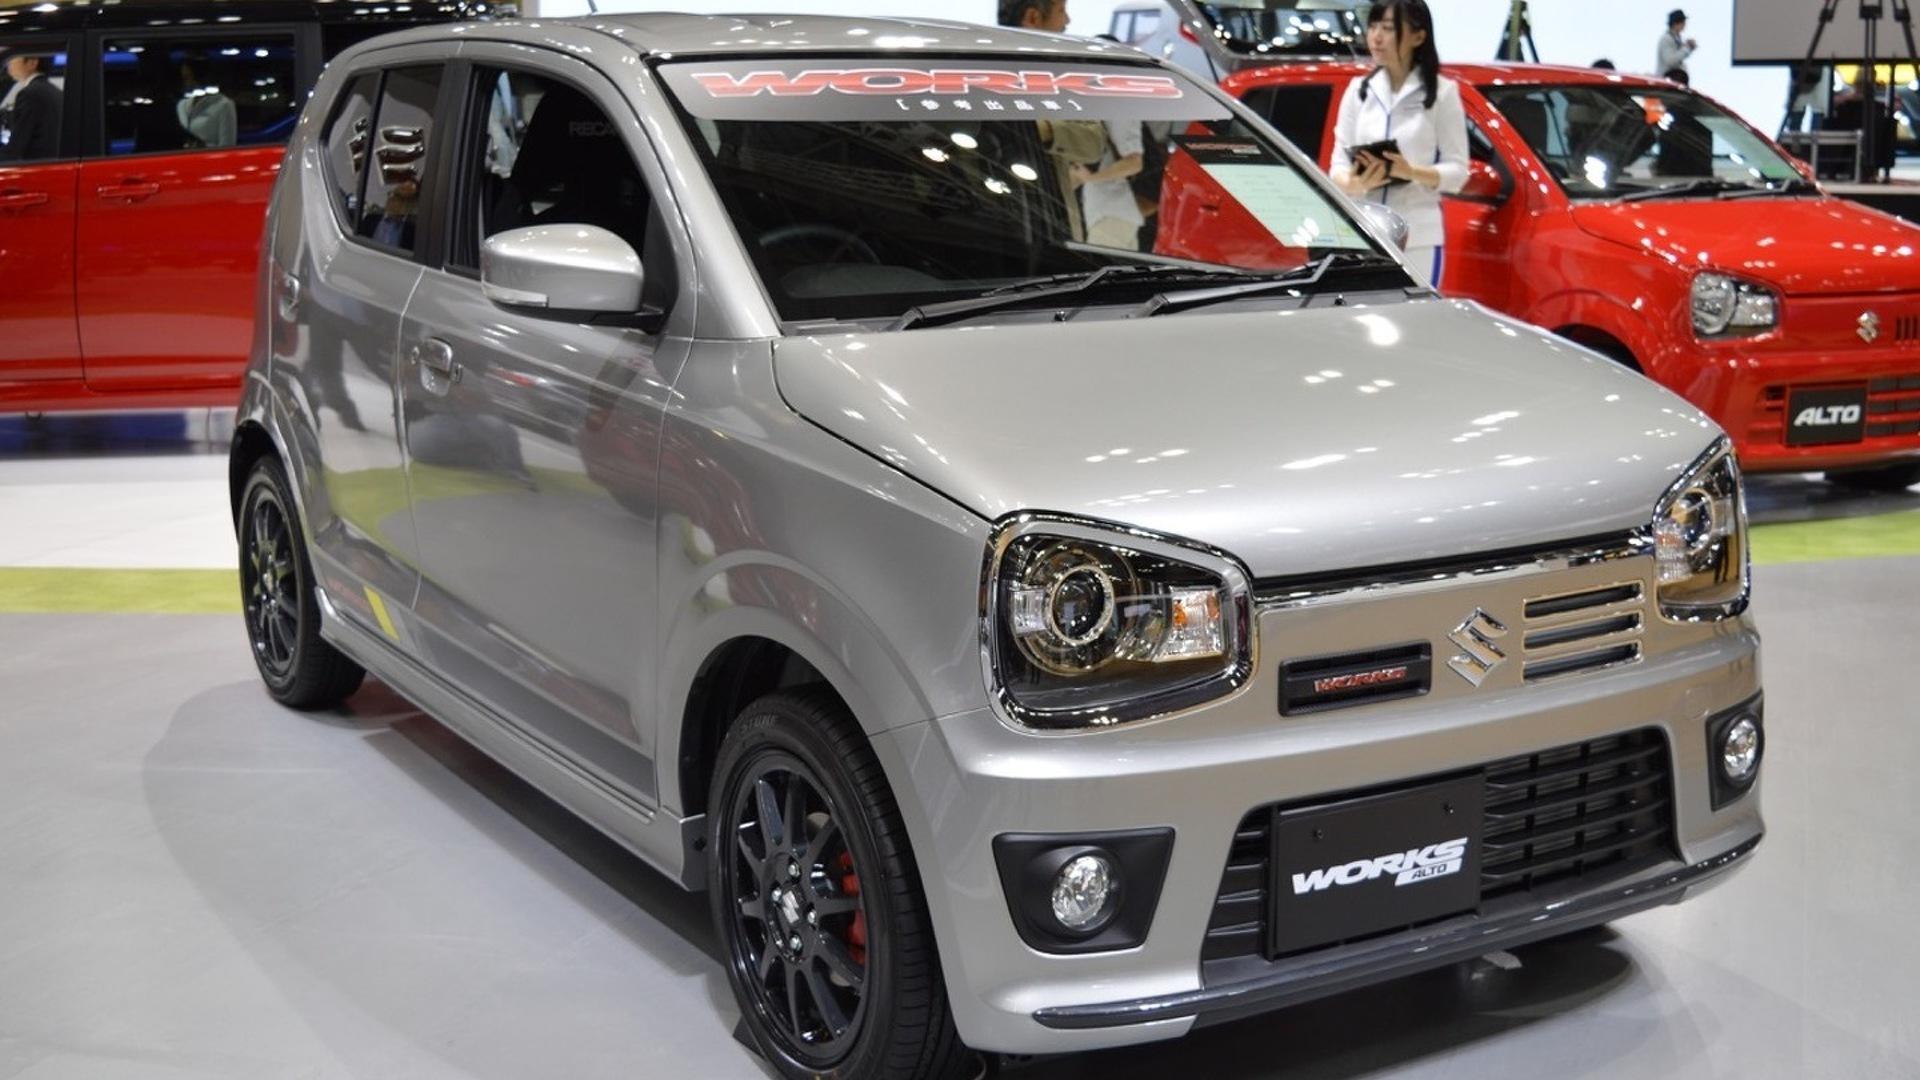 Suzuki Alto Works bows in Tokyo with mighty... 51 bhp